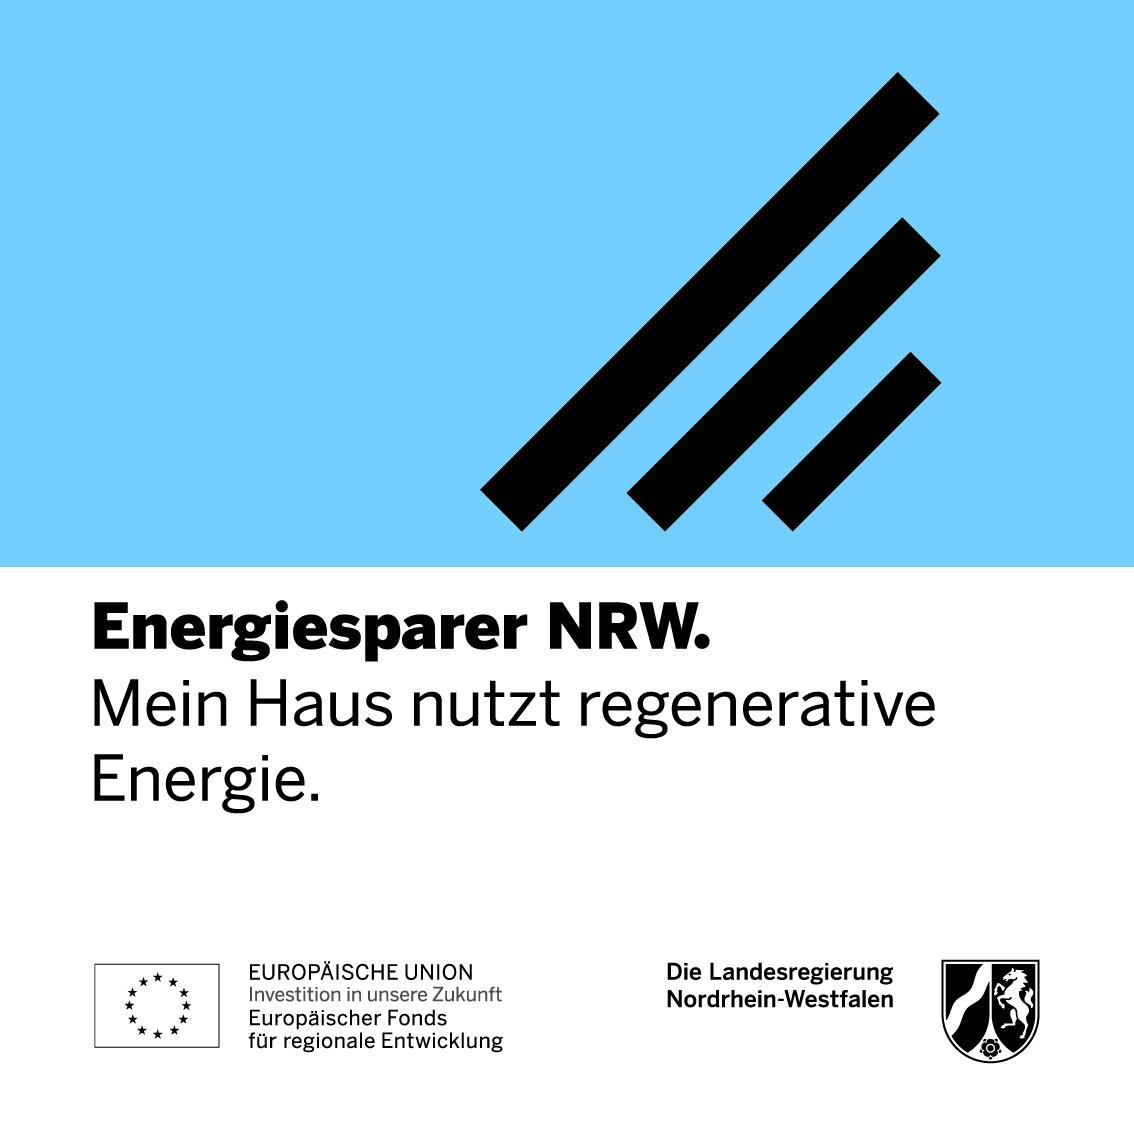 Energiesparer NRW